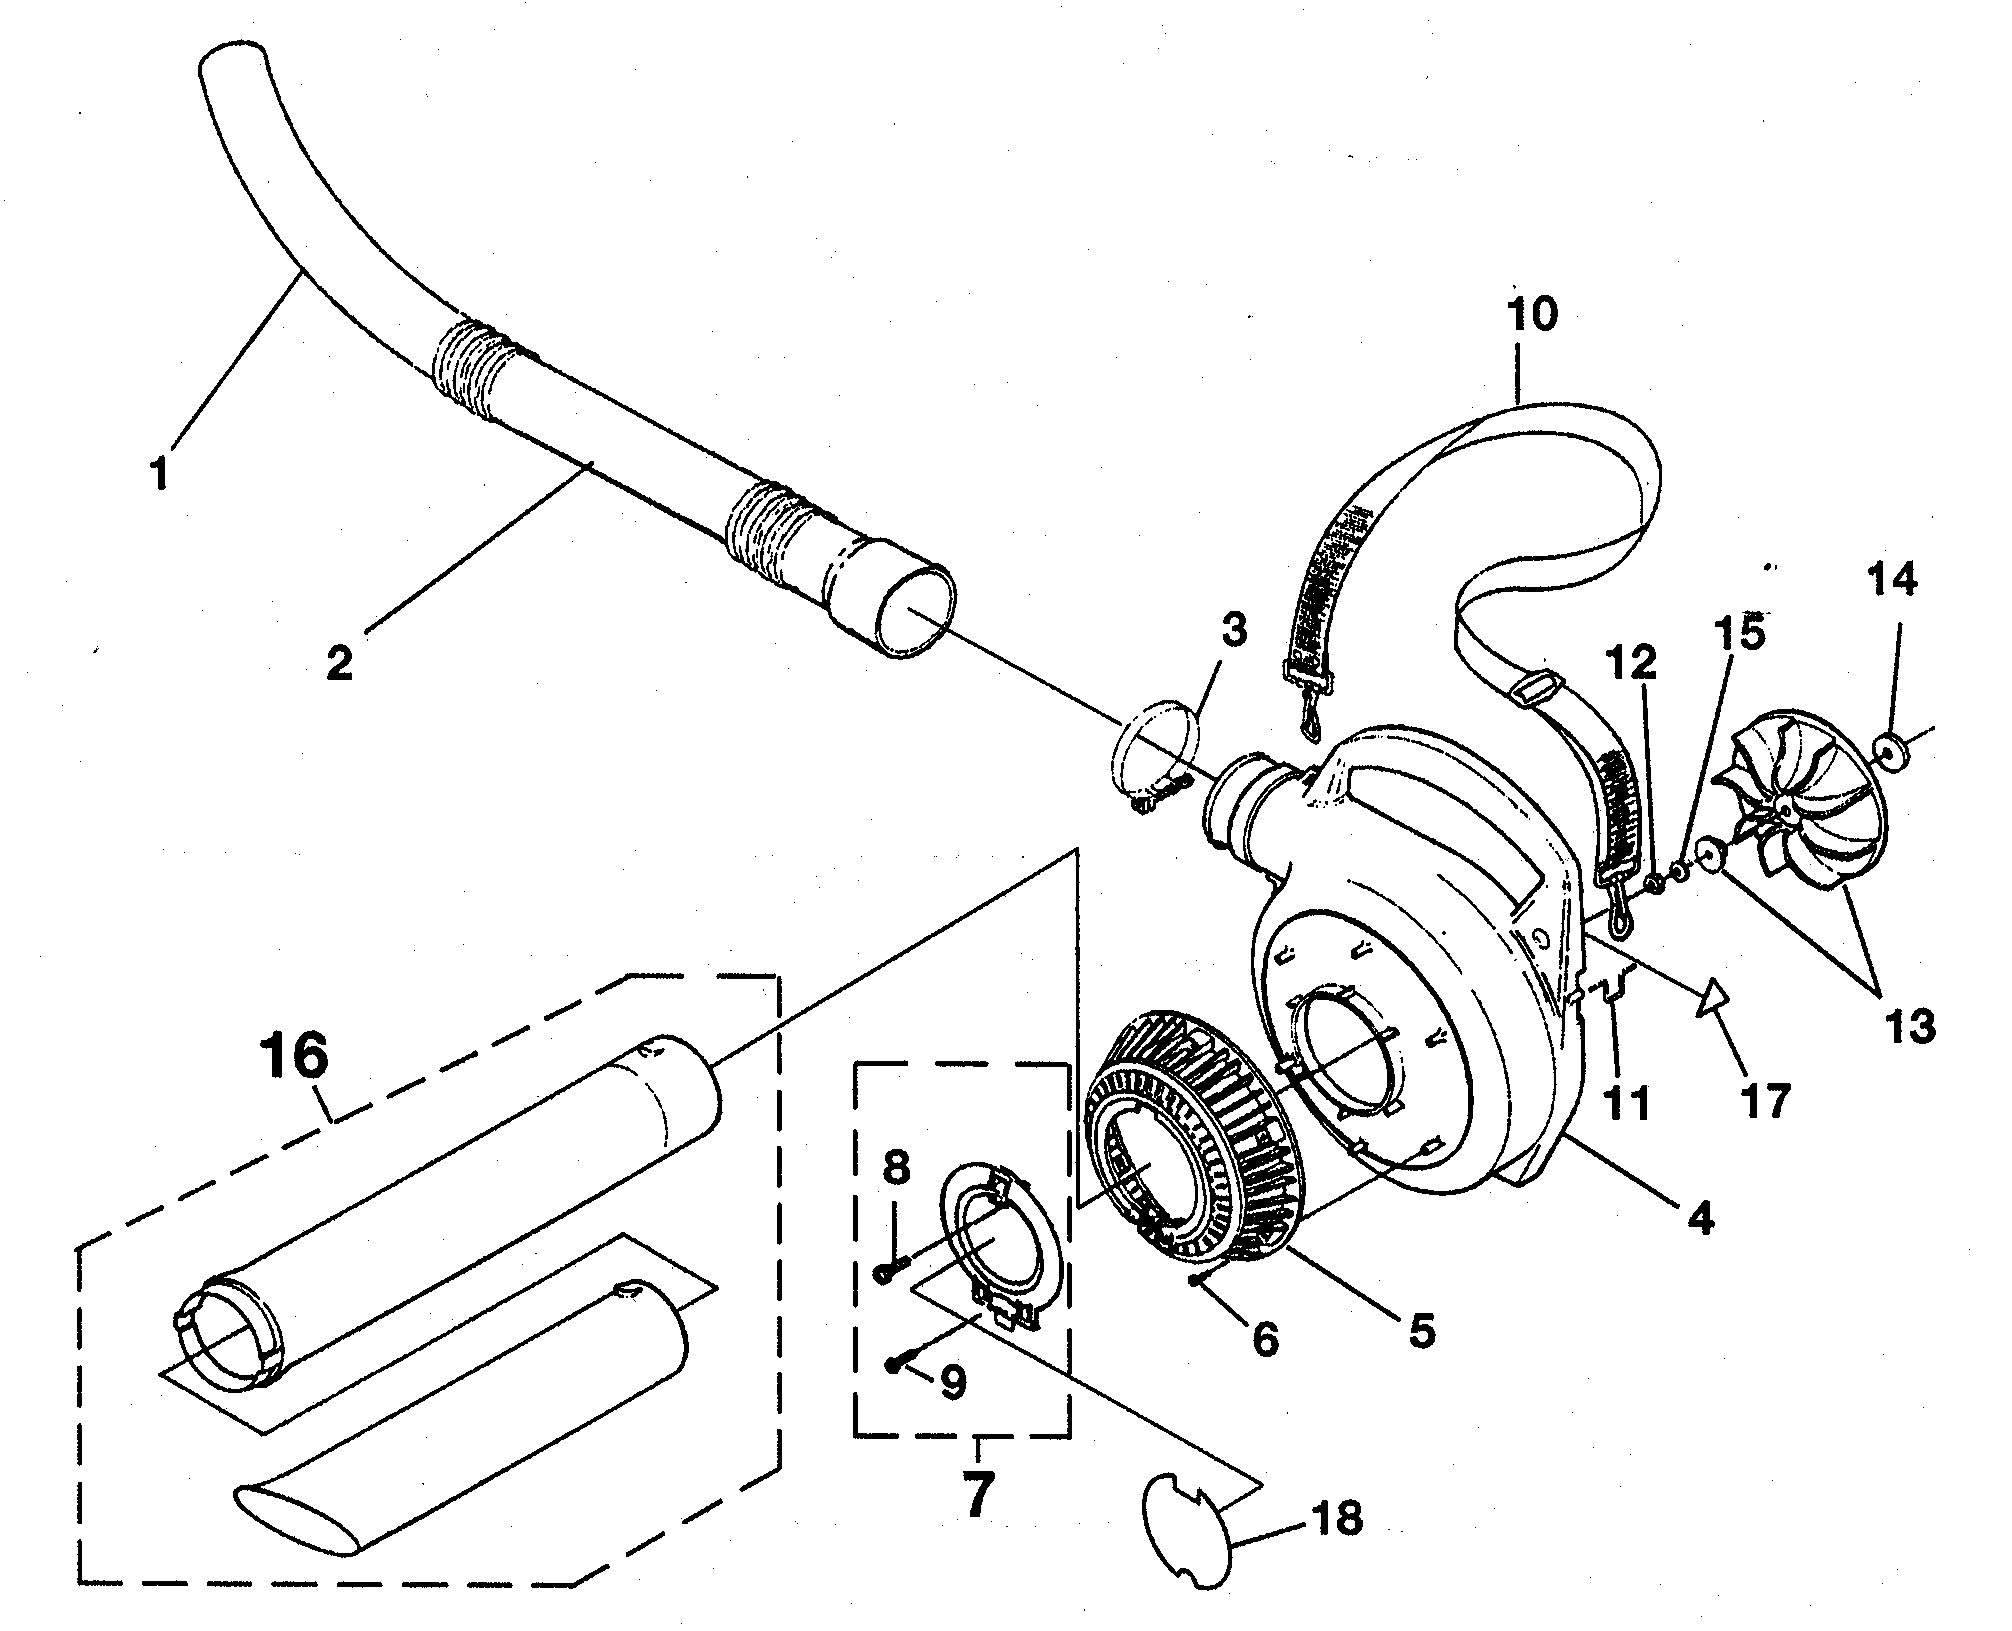 Homelite model UT08121 blower, gas genuine parts